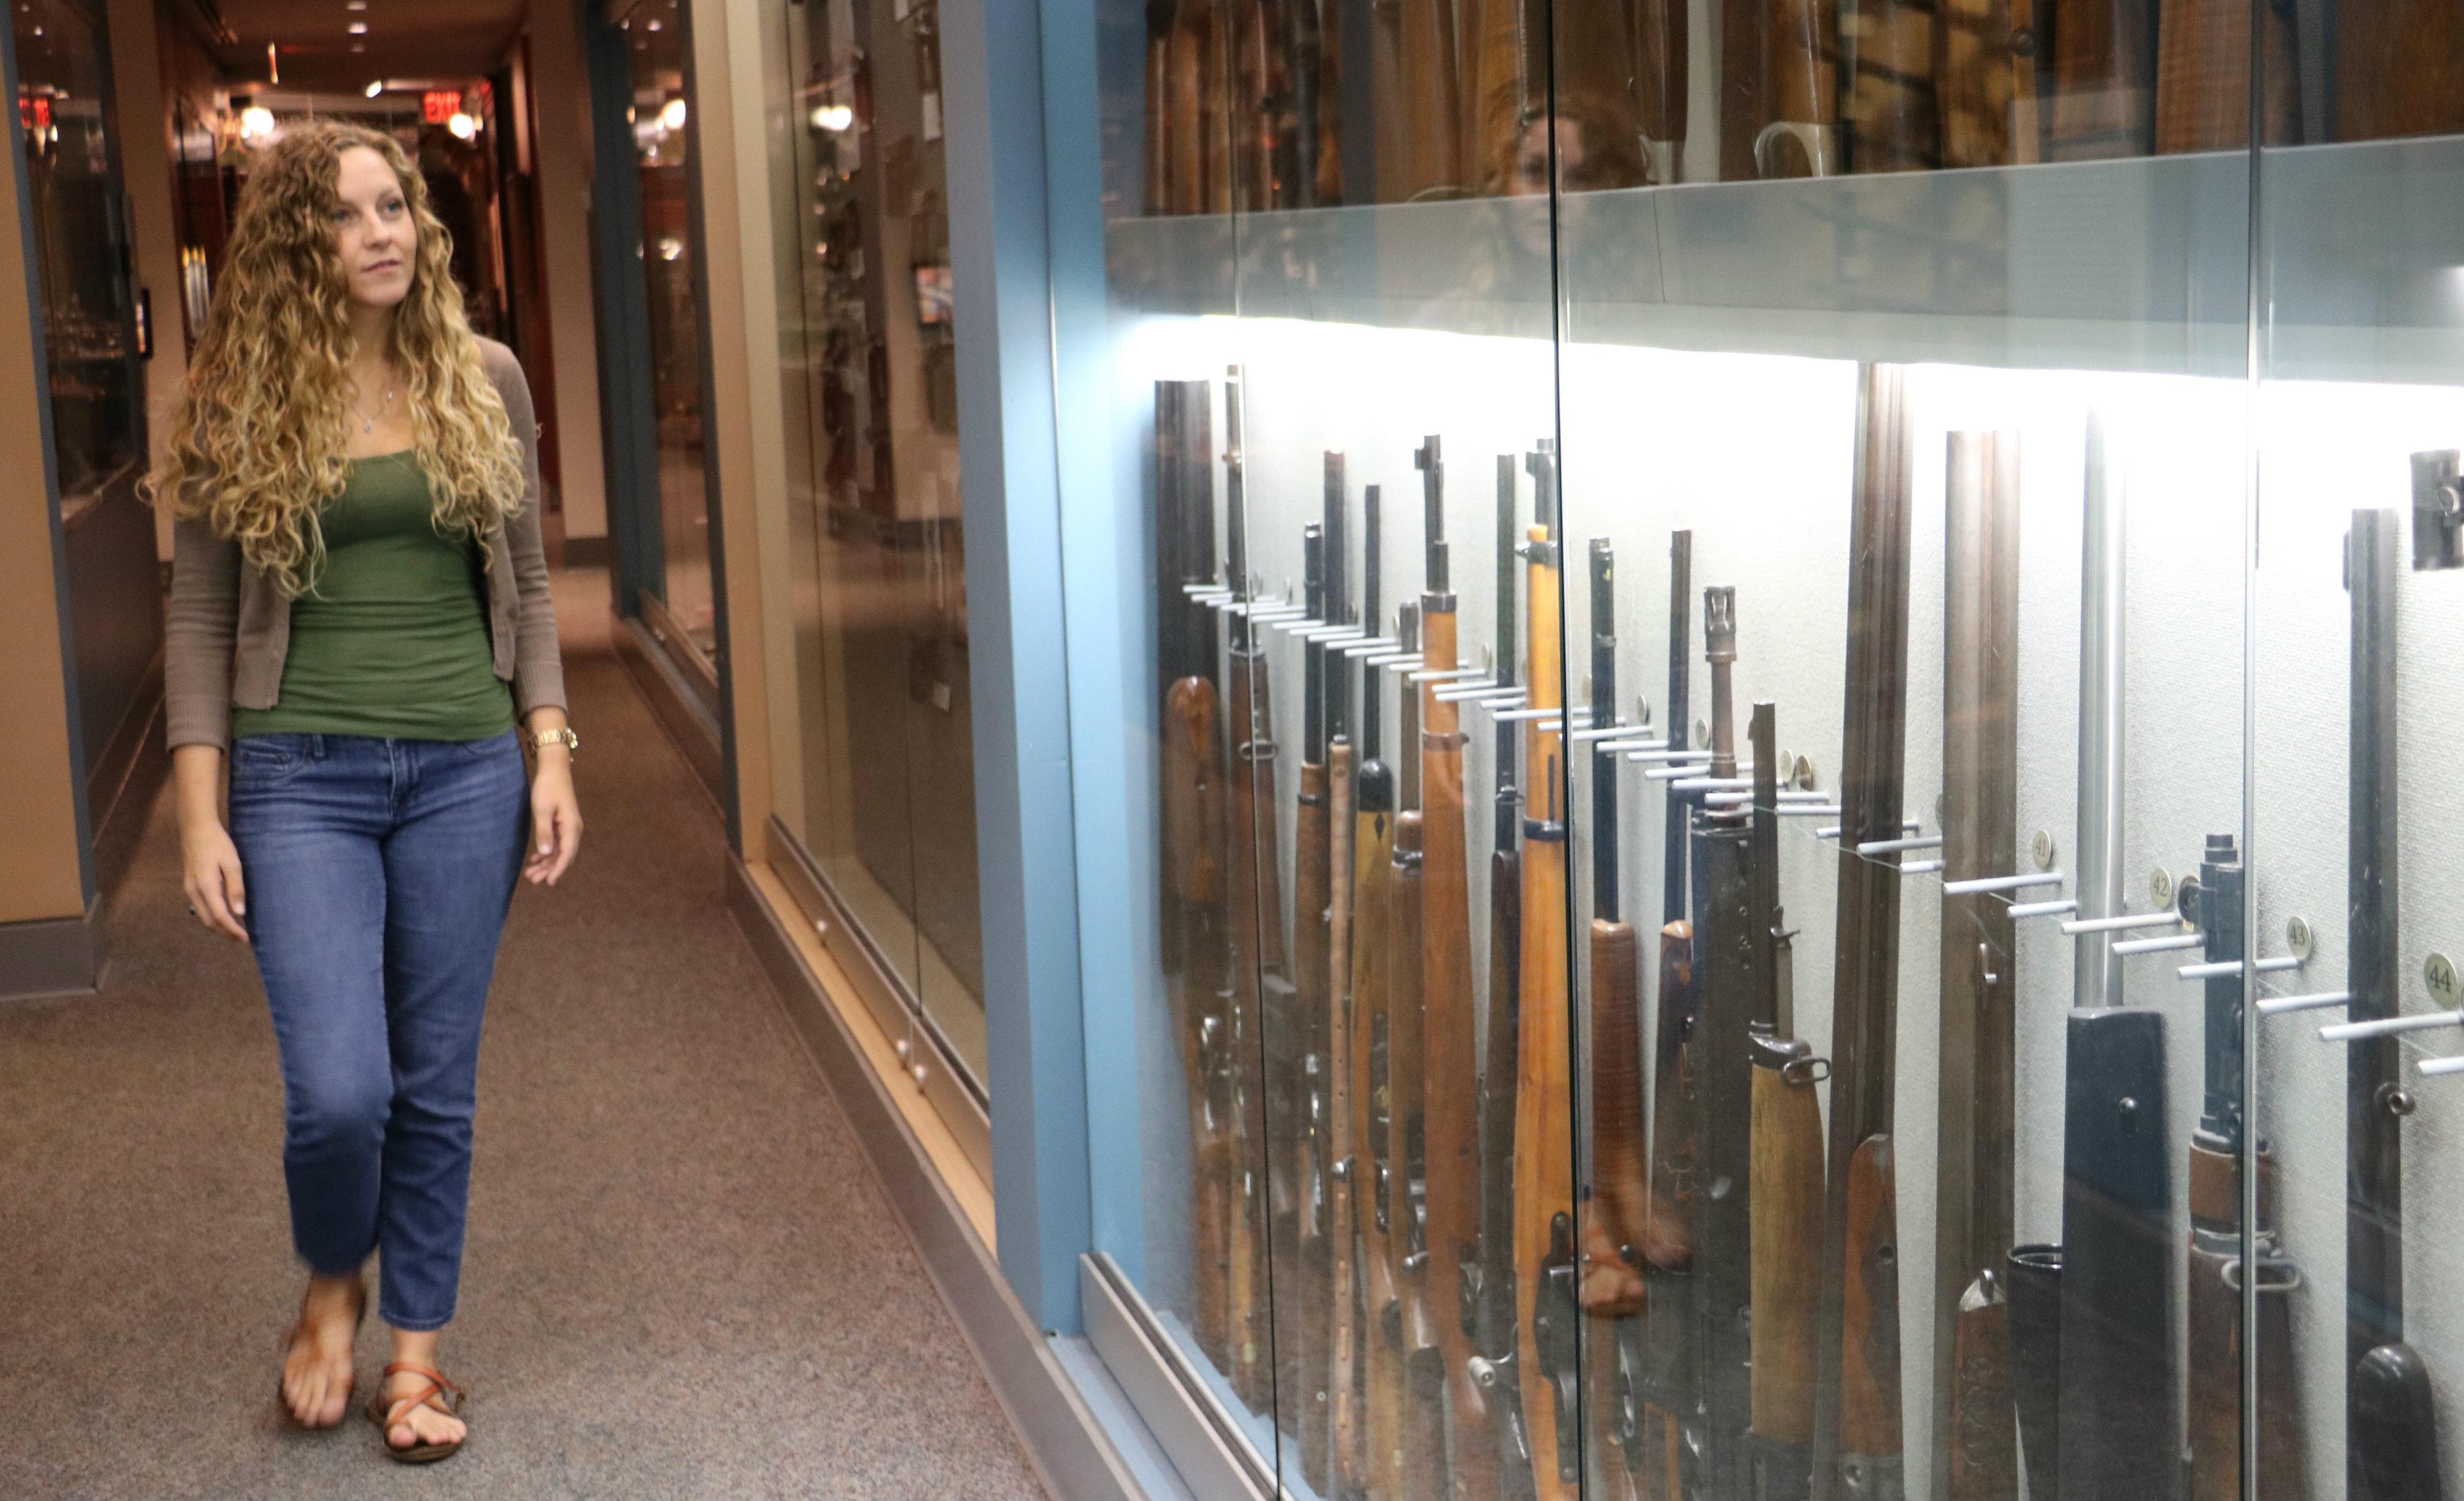 nicole sanders hallway nra museum embed